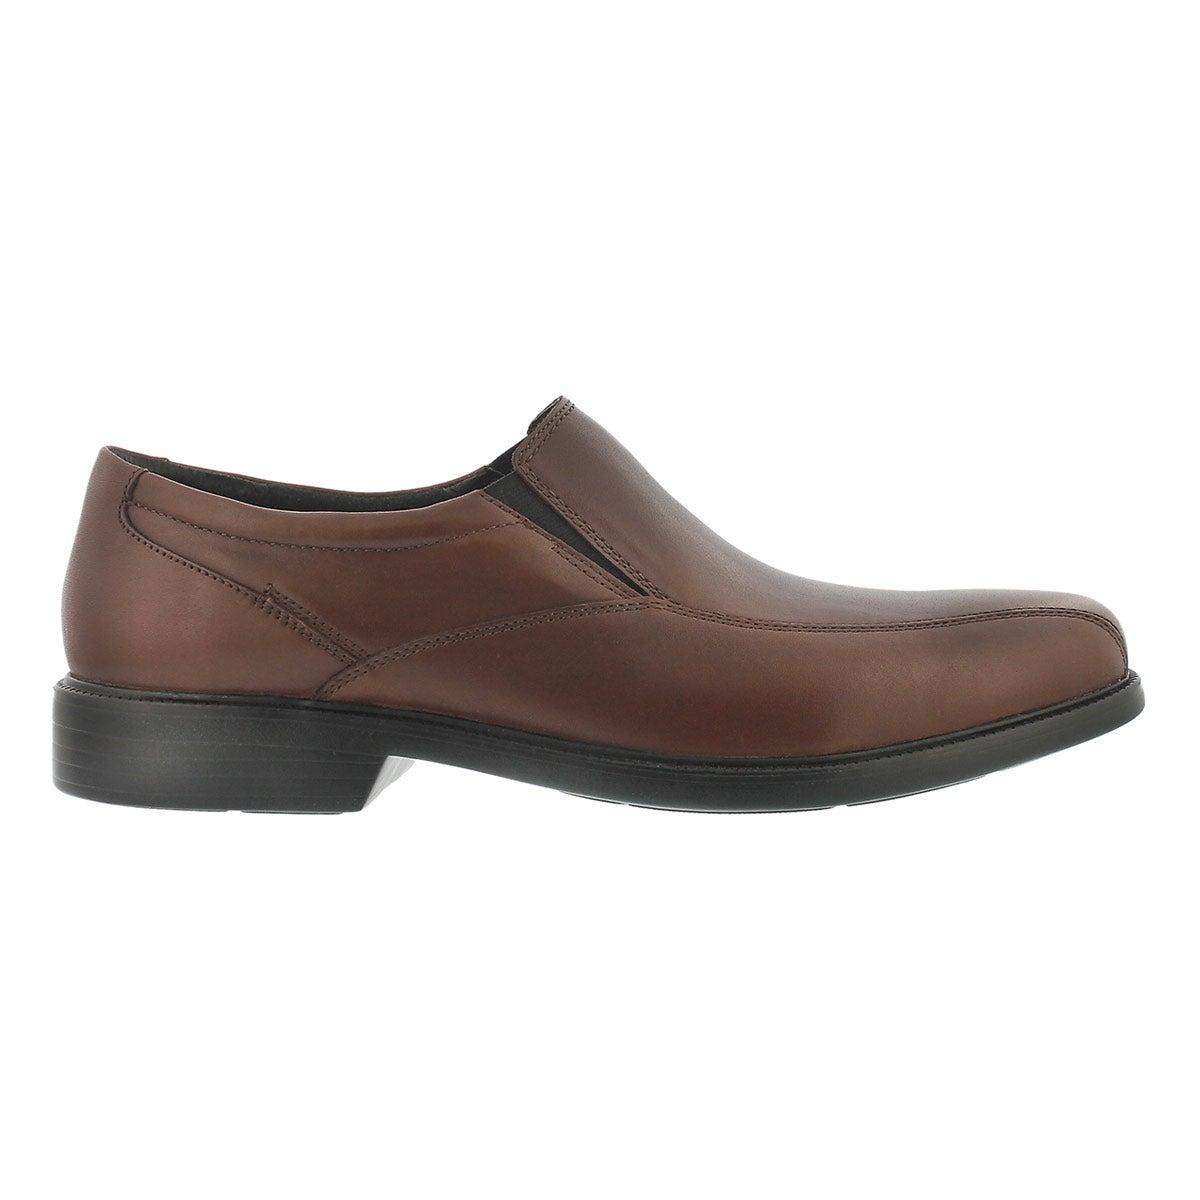 Mns Bolton brown dress slip on